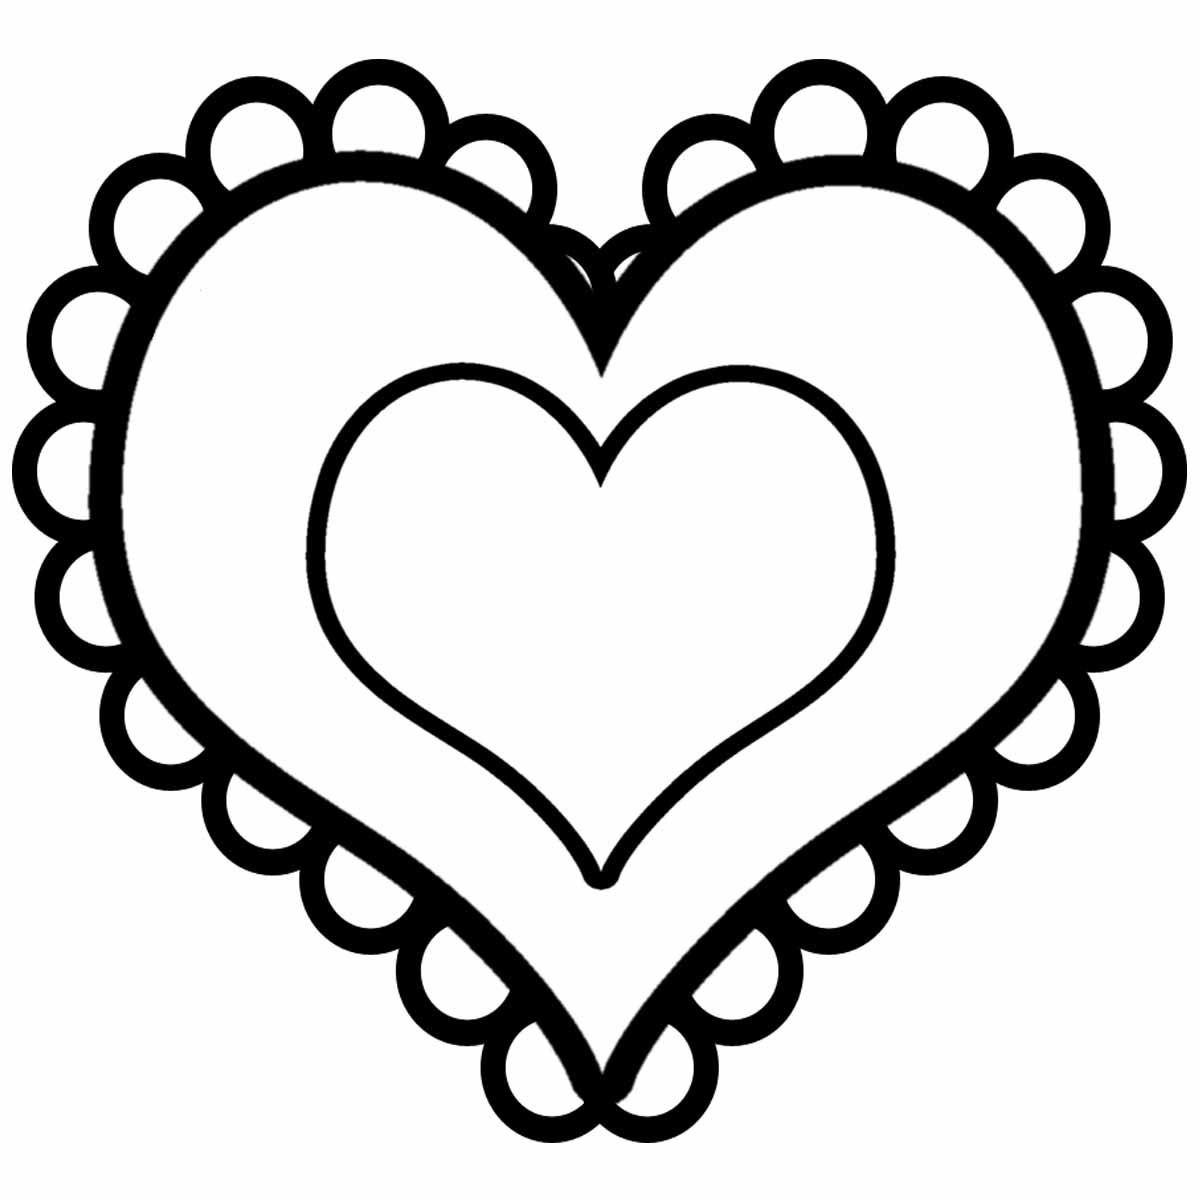 Clip Art Heart Black And White Clipart Panda